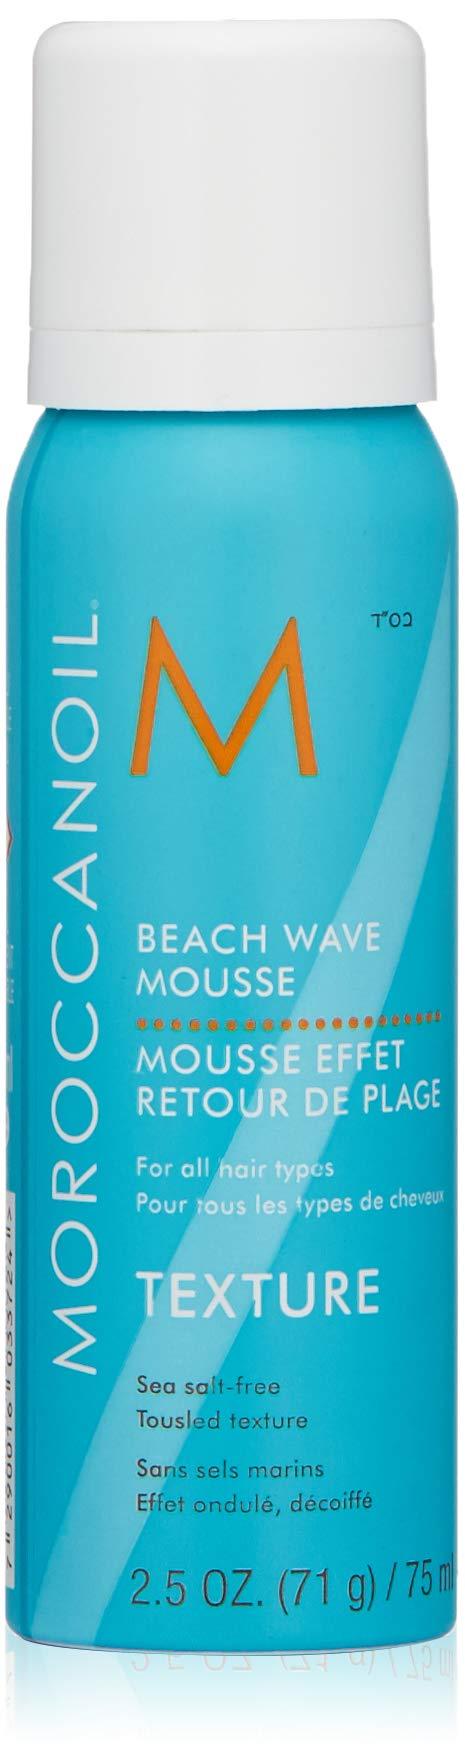 Moroccanoil Beach Wave Mousse, 2.5 fl oz by MOROCCANOIL